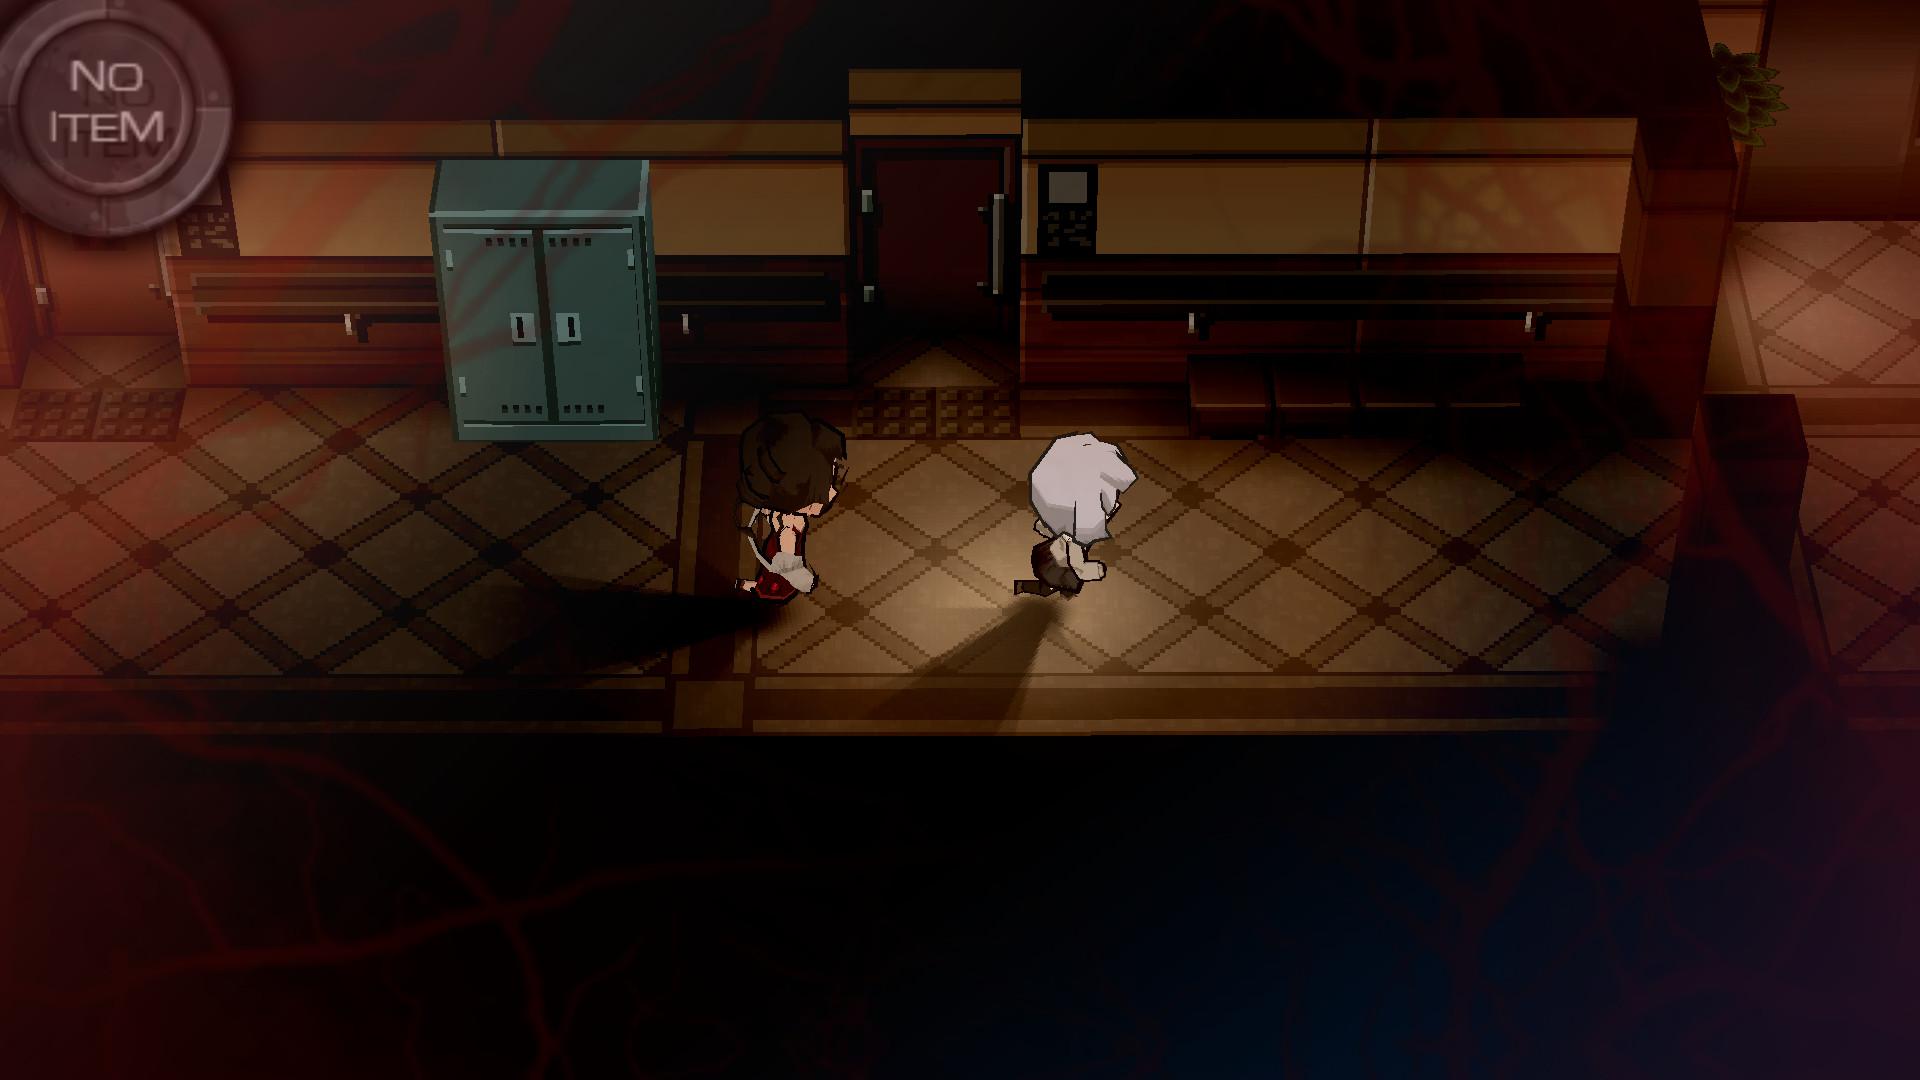 corpse-party-2-dead-patient-screenshot-12